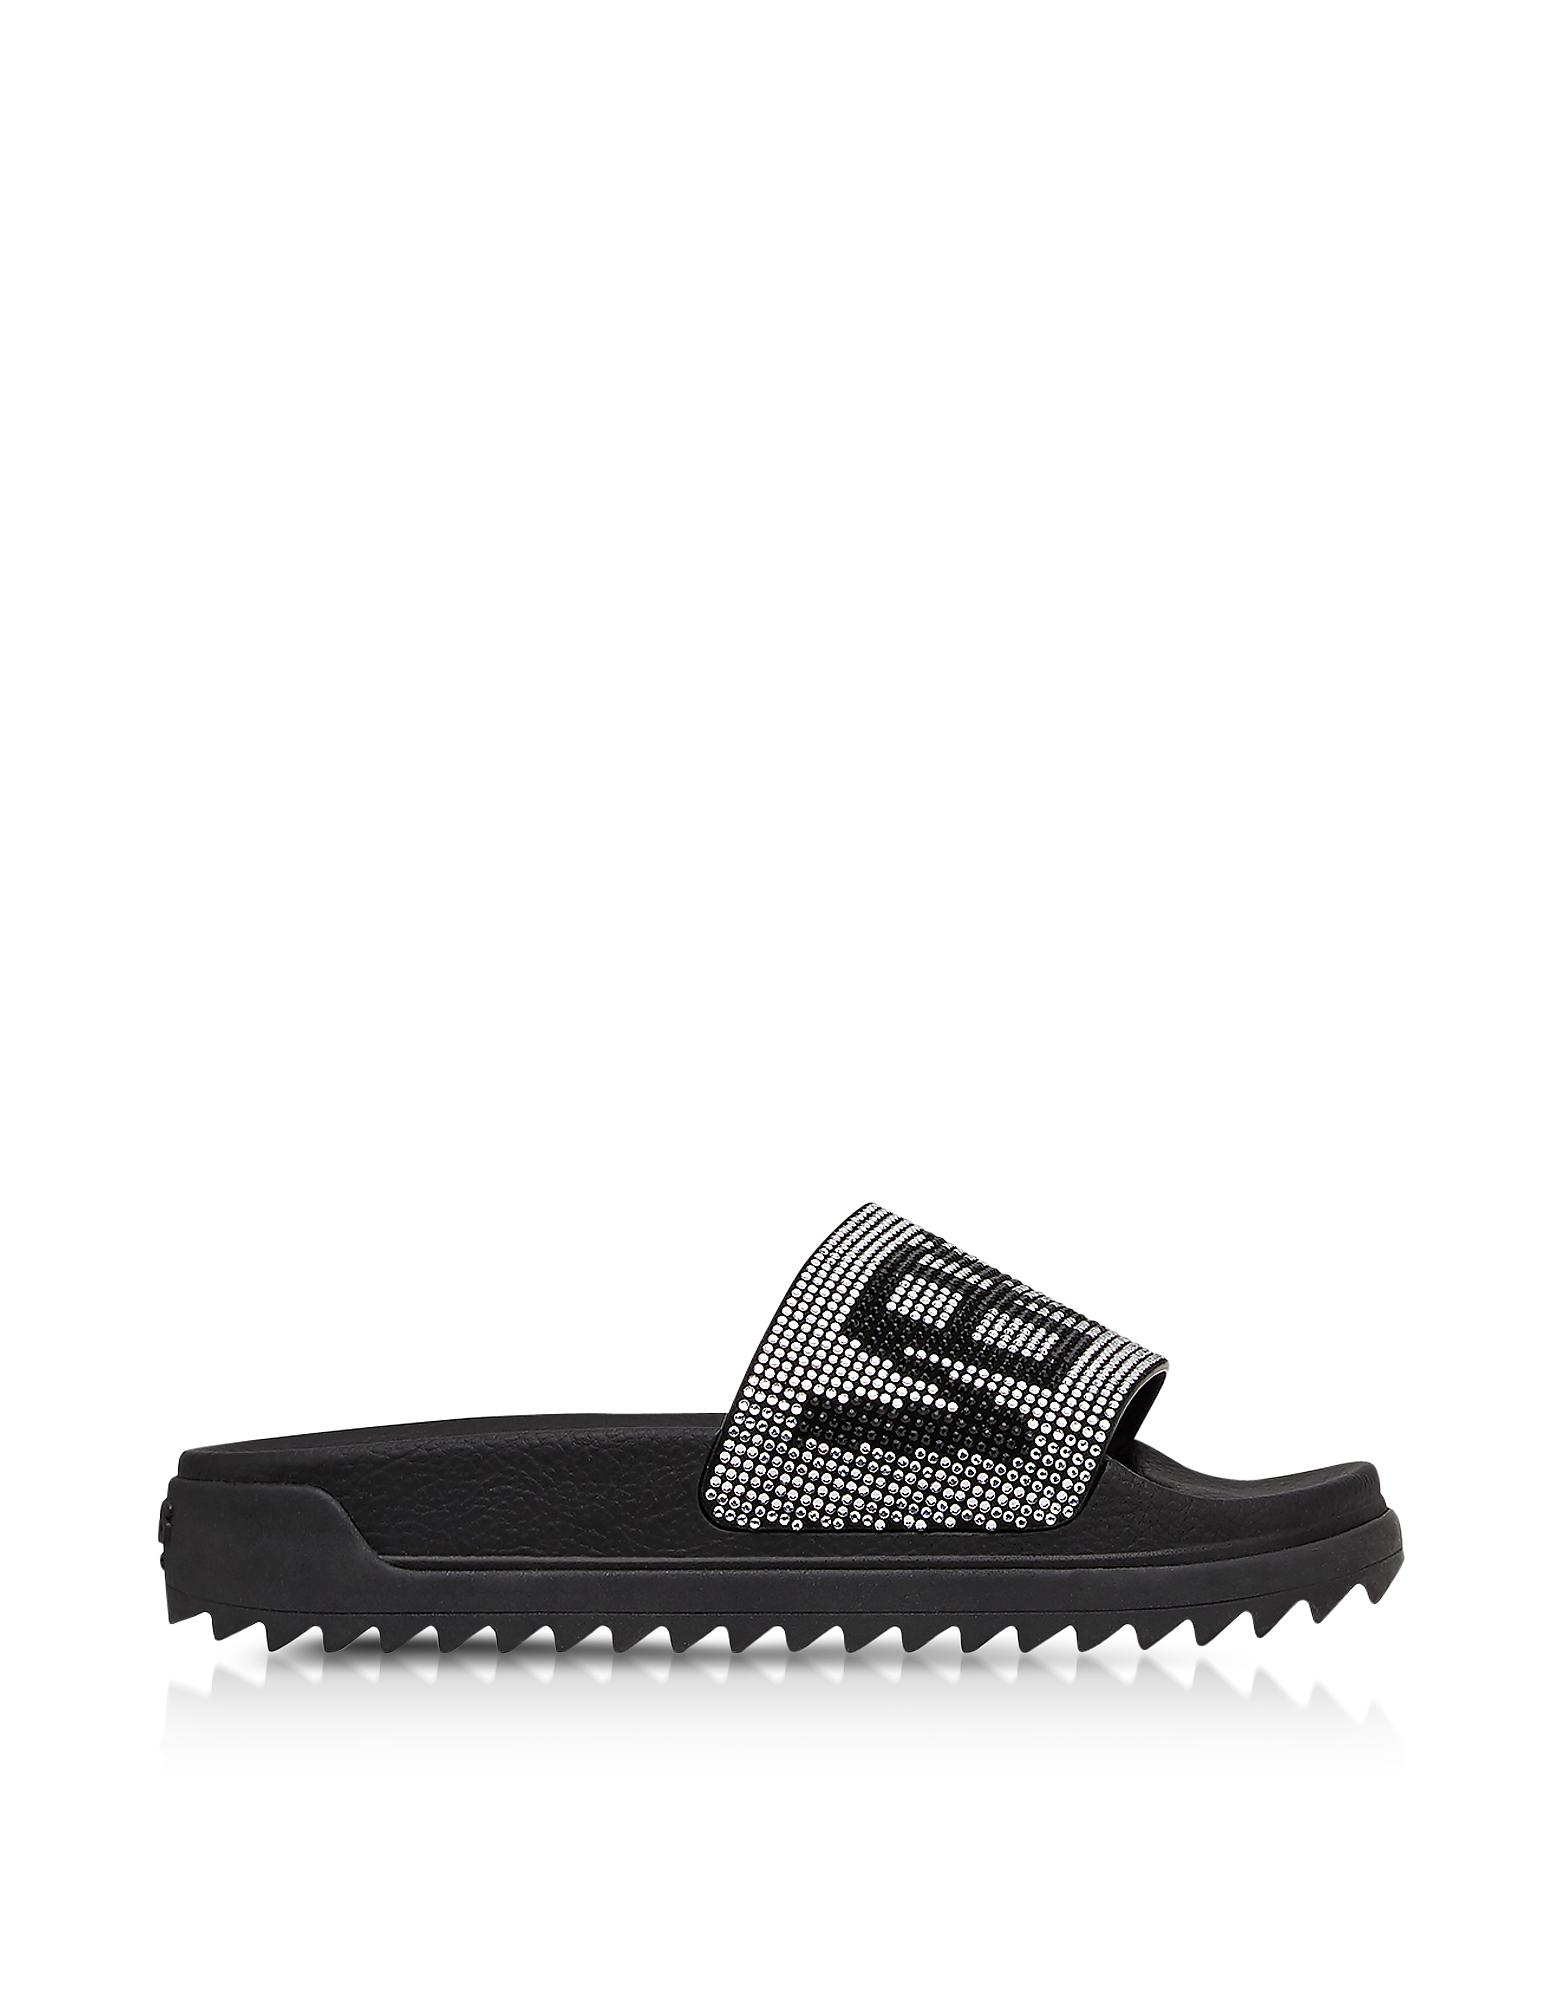 Versace Versus Shoes, Black Crystals and Suede Slide Sandals